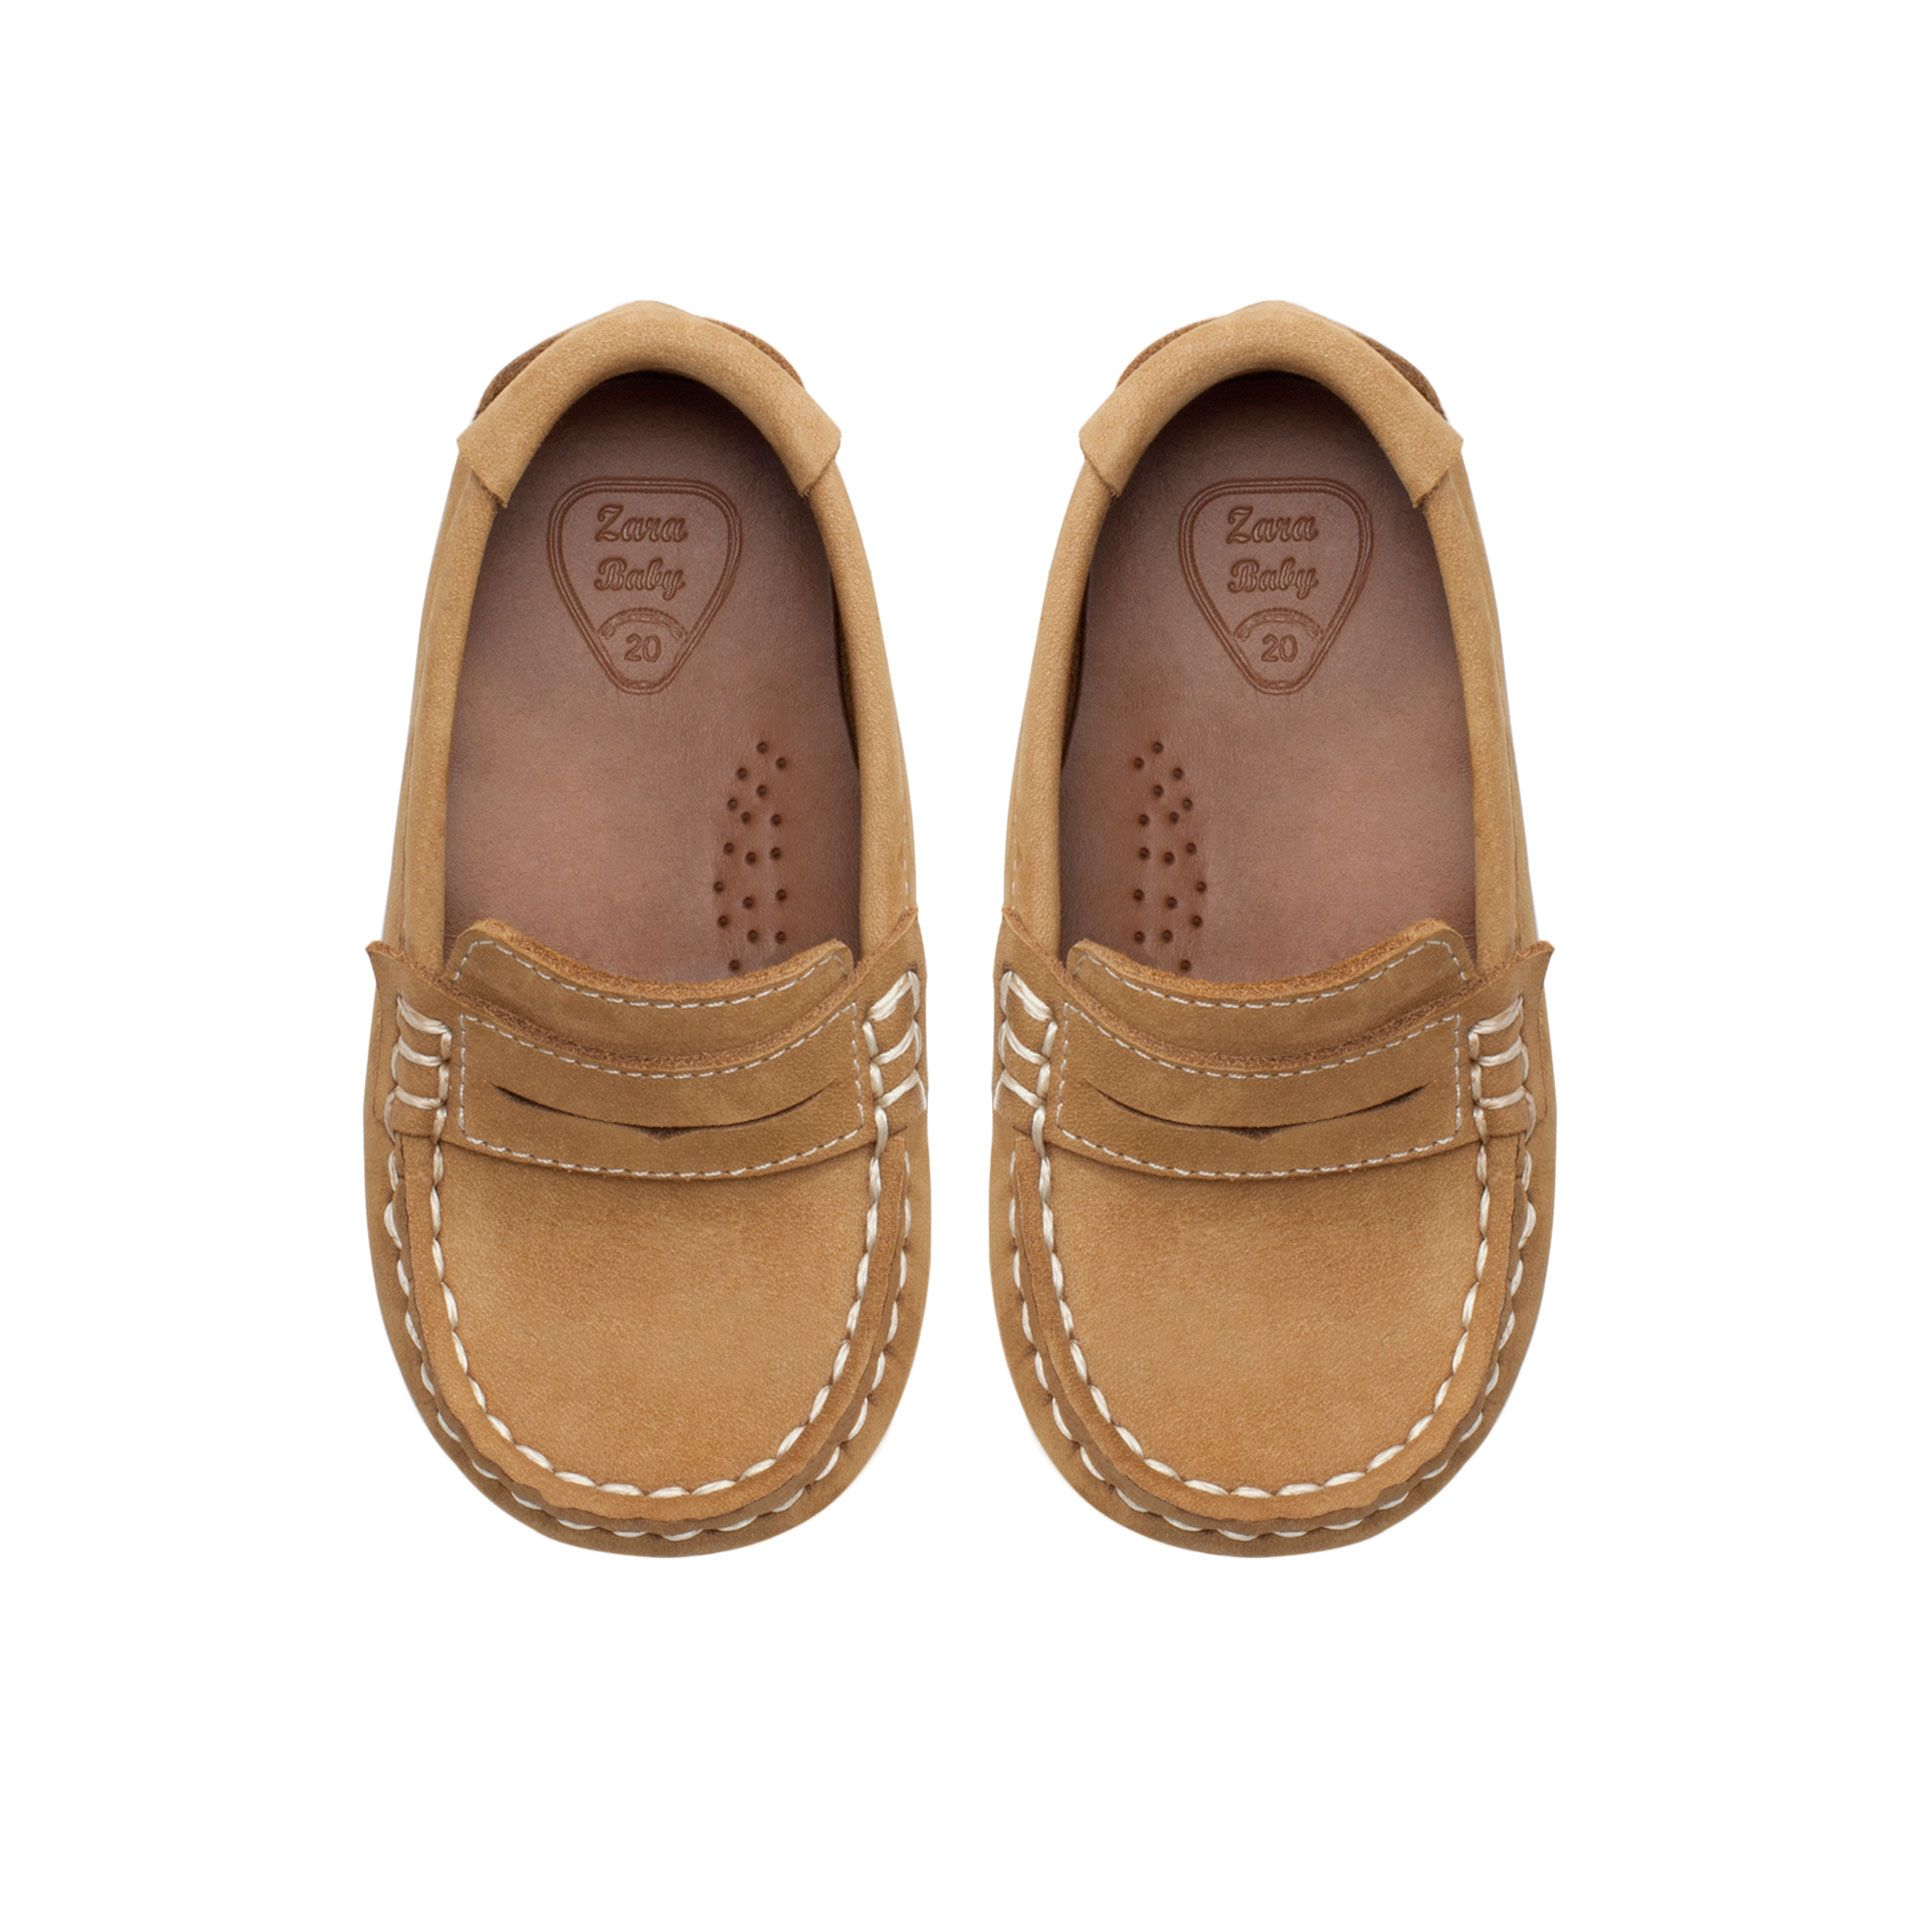 Leather moccasin - Shoes - Baby boy - Kids | ZARA United ...